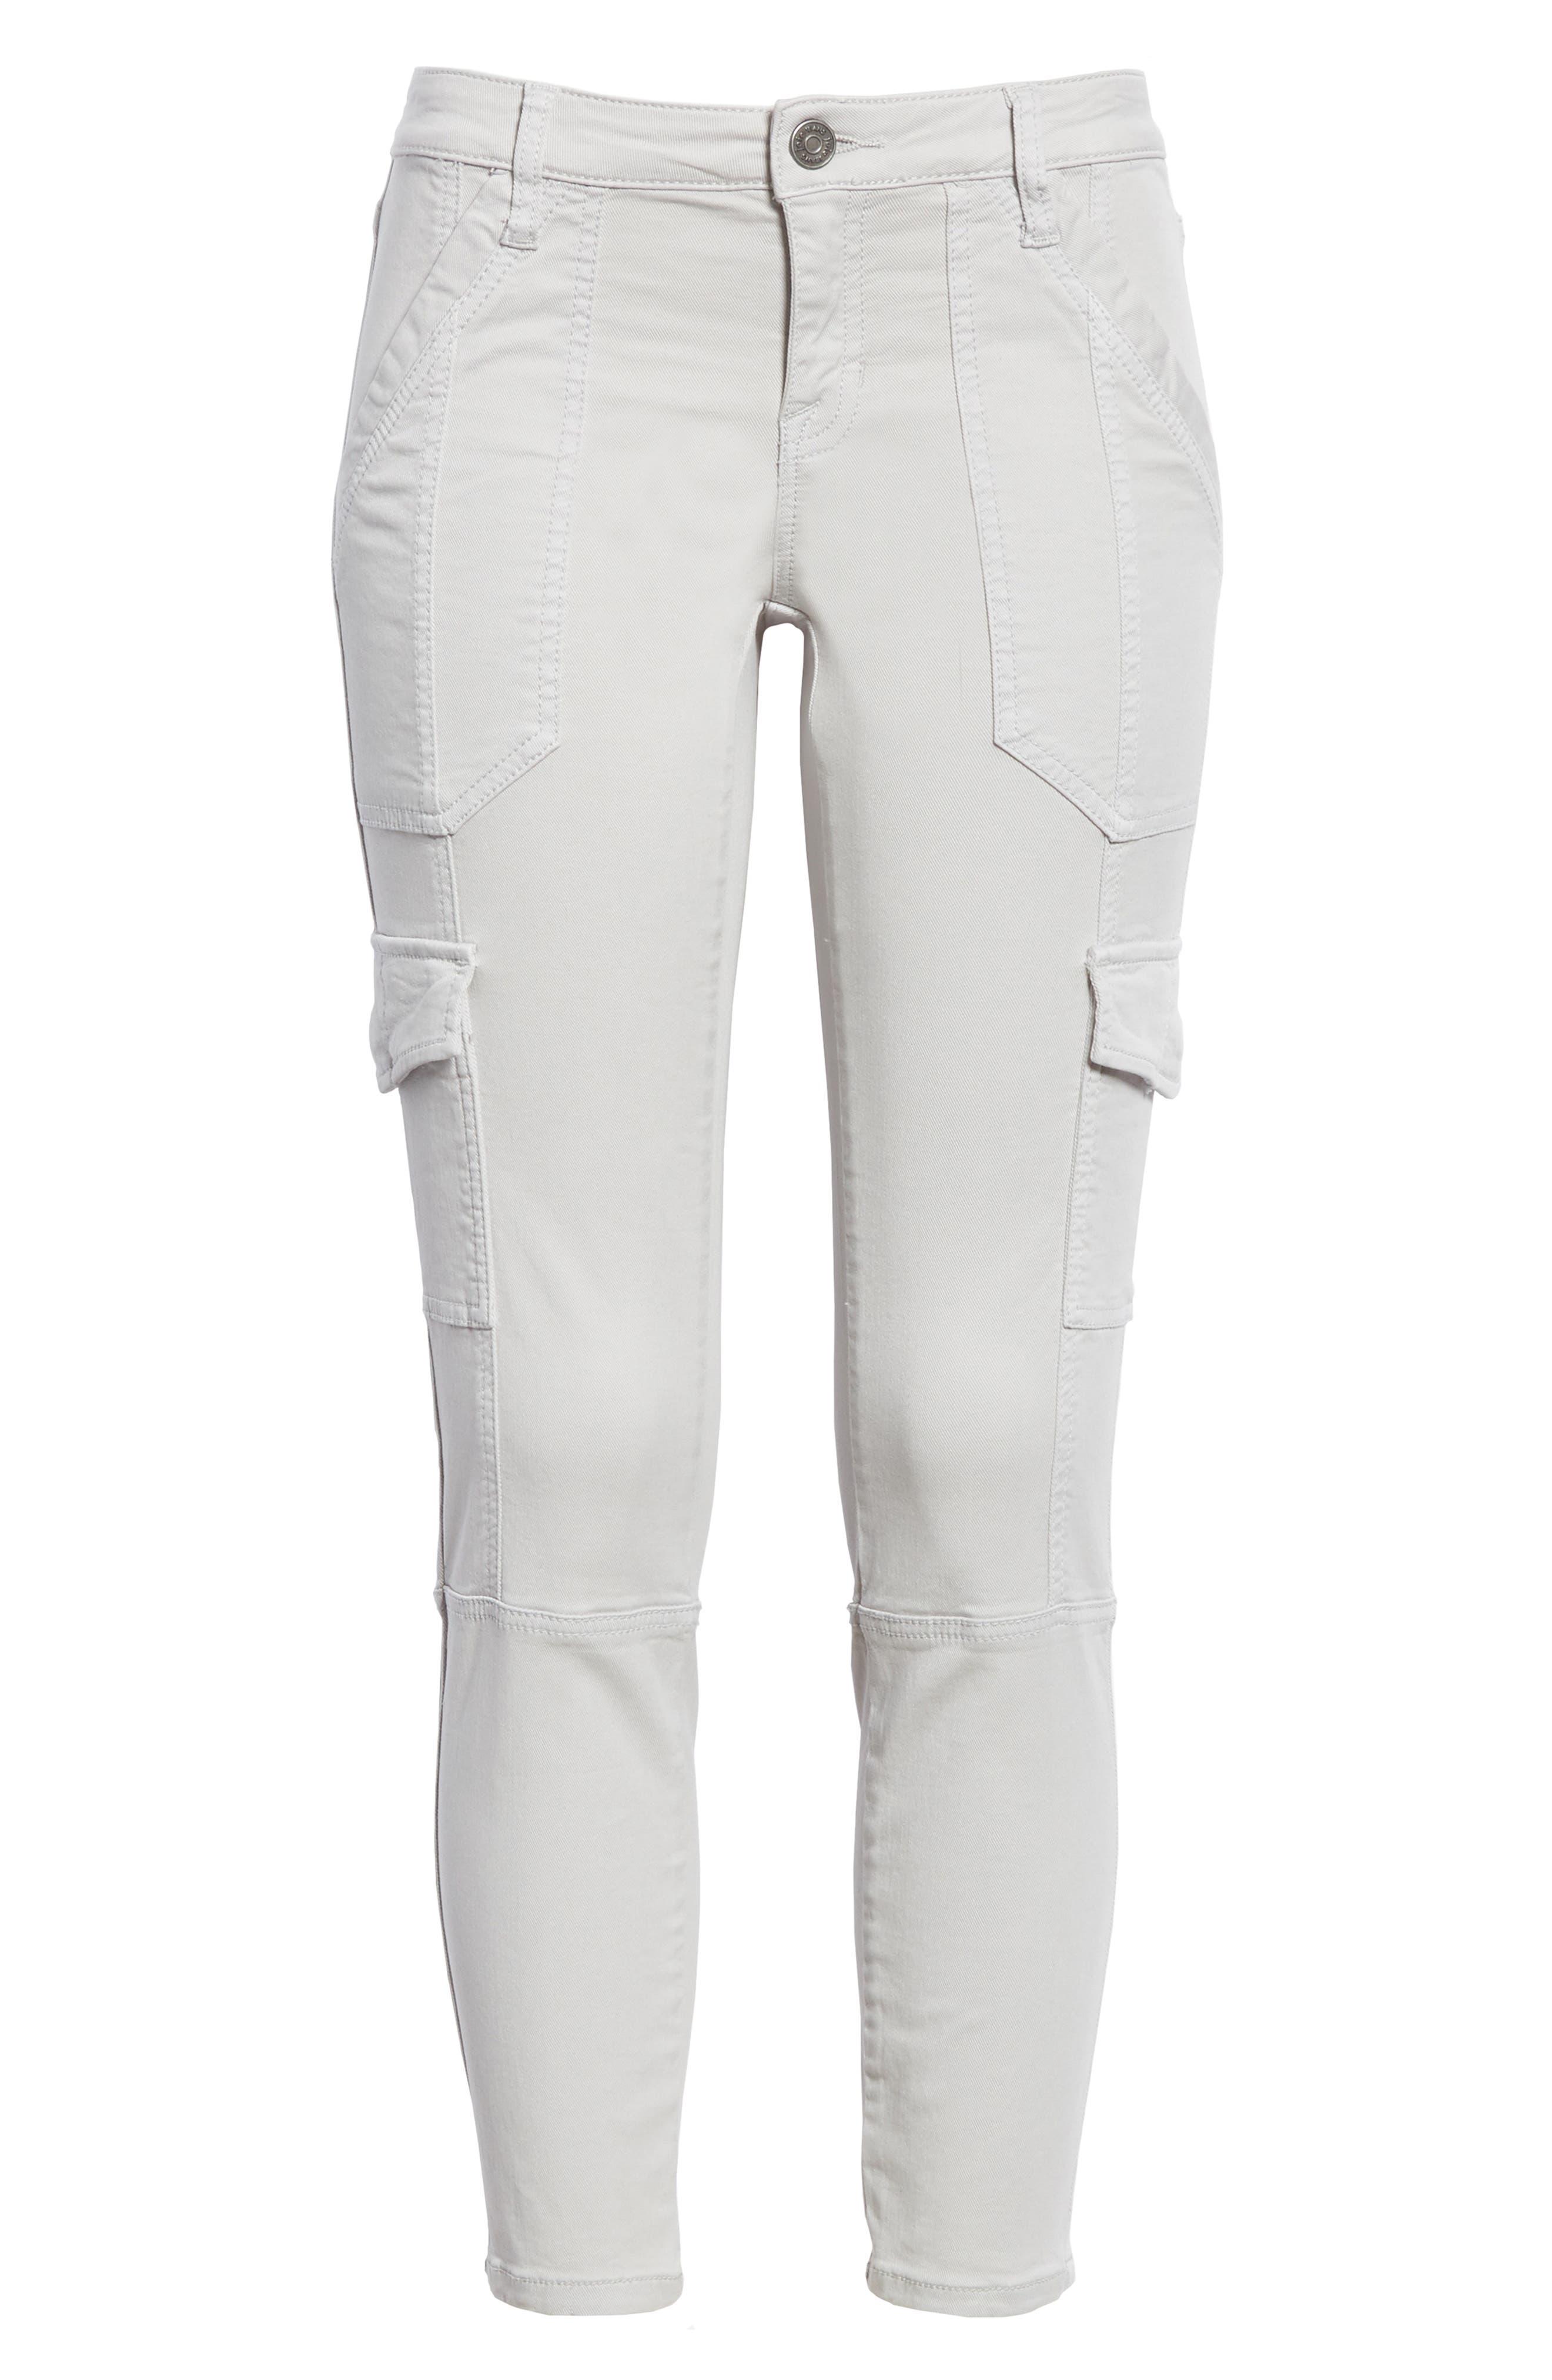 Okana Skinny Cargo Pants,                             Alternate thumbnail 6, color,                             034